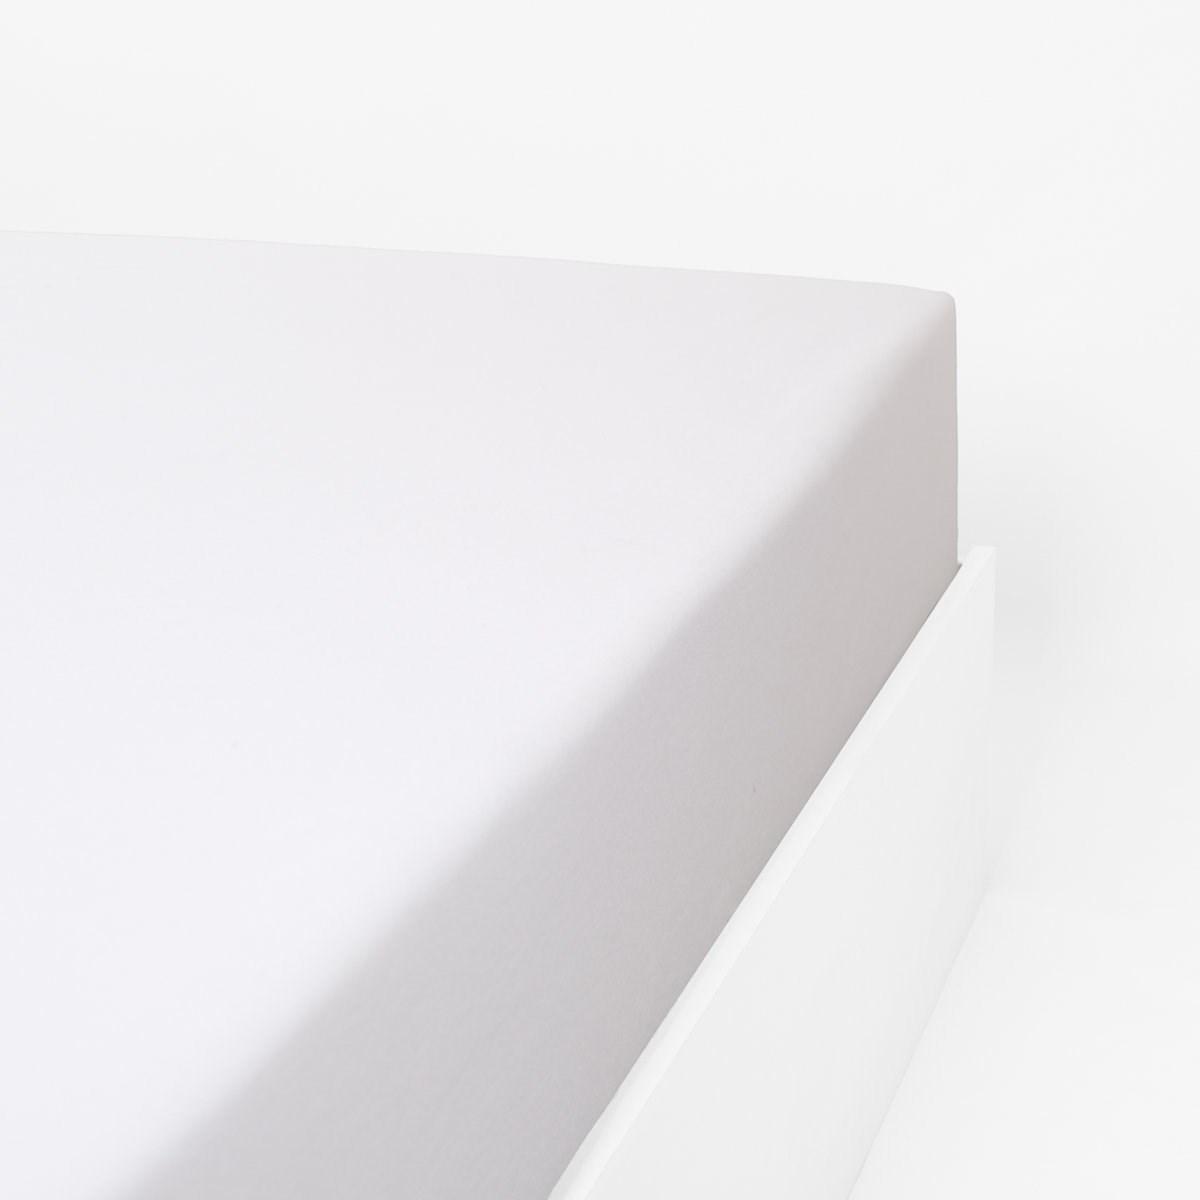 Drap housse flanelle en Molleton Blanc 140x190 cm